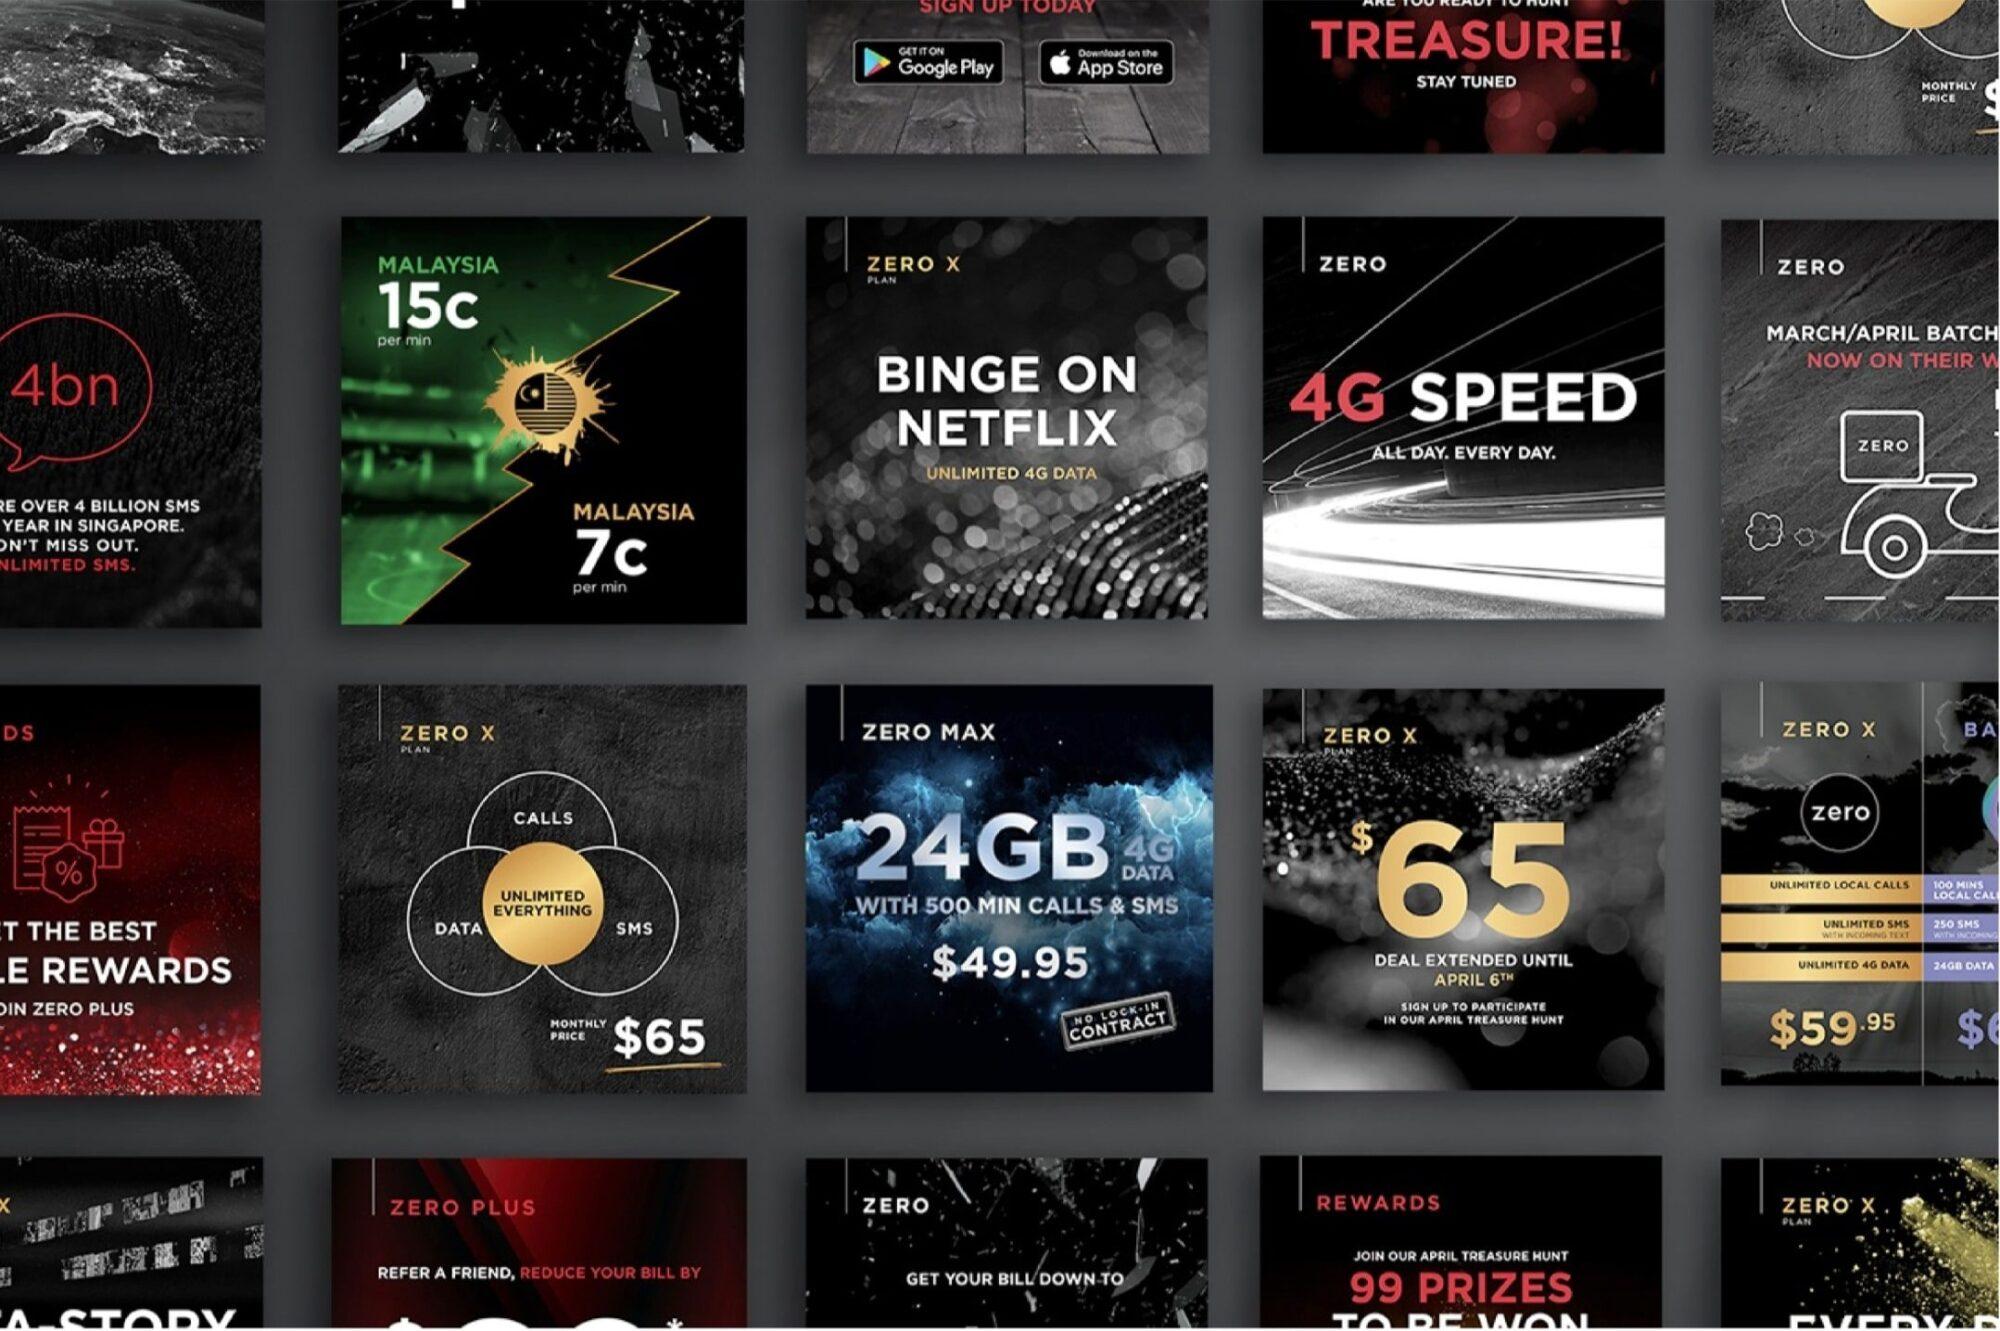 Zero Advertising Designs